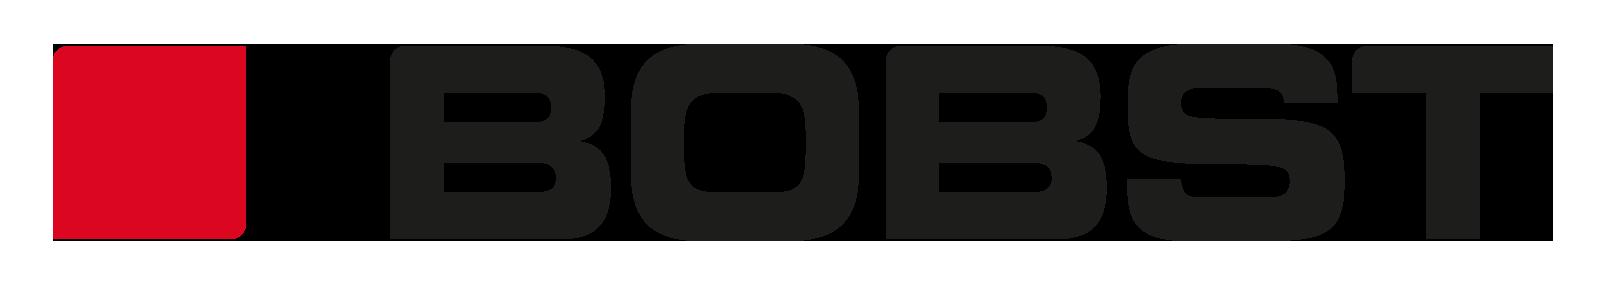 Bobst Meerbusch GmbH